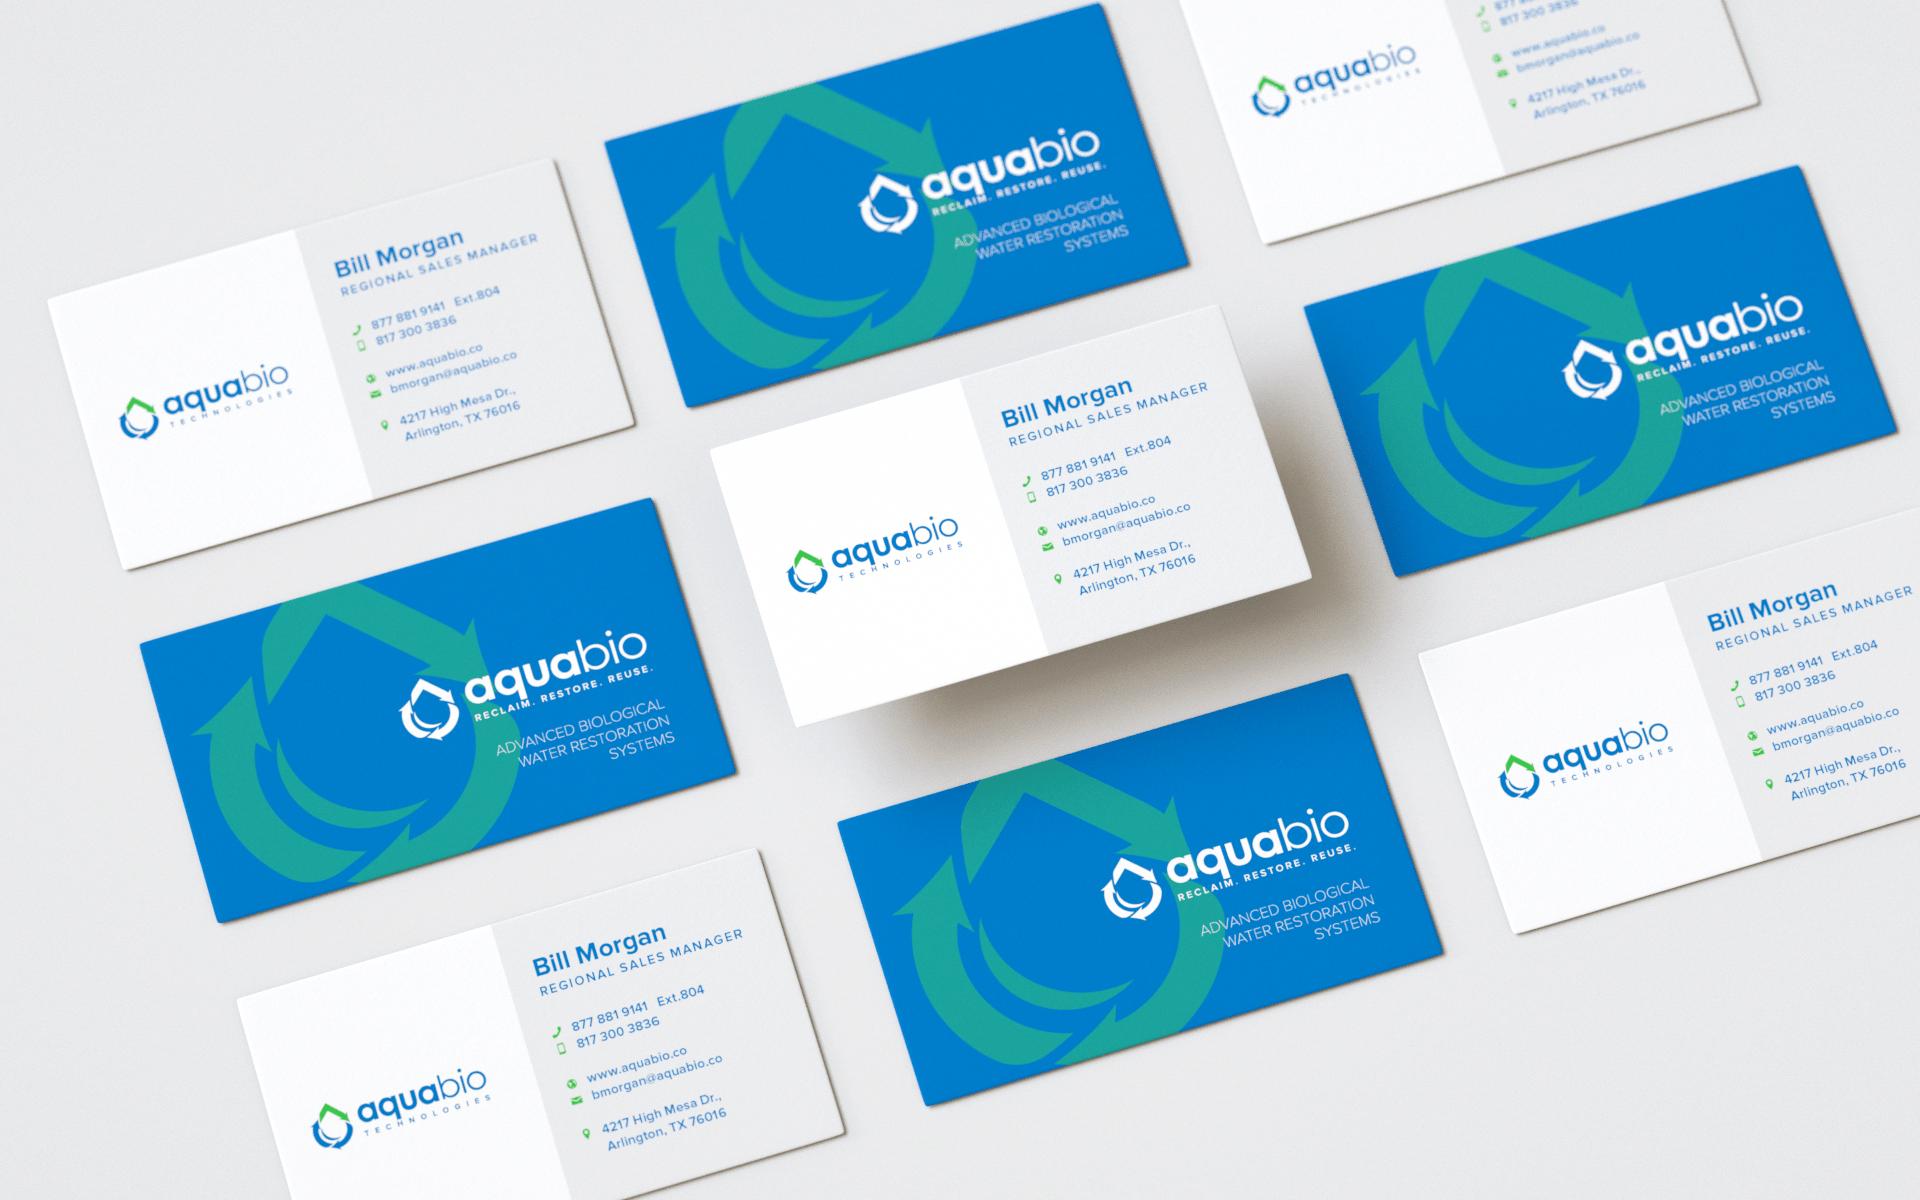 AQUA BIO TECHNOLOGIES BUSINESS CARD DESIGN